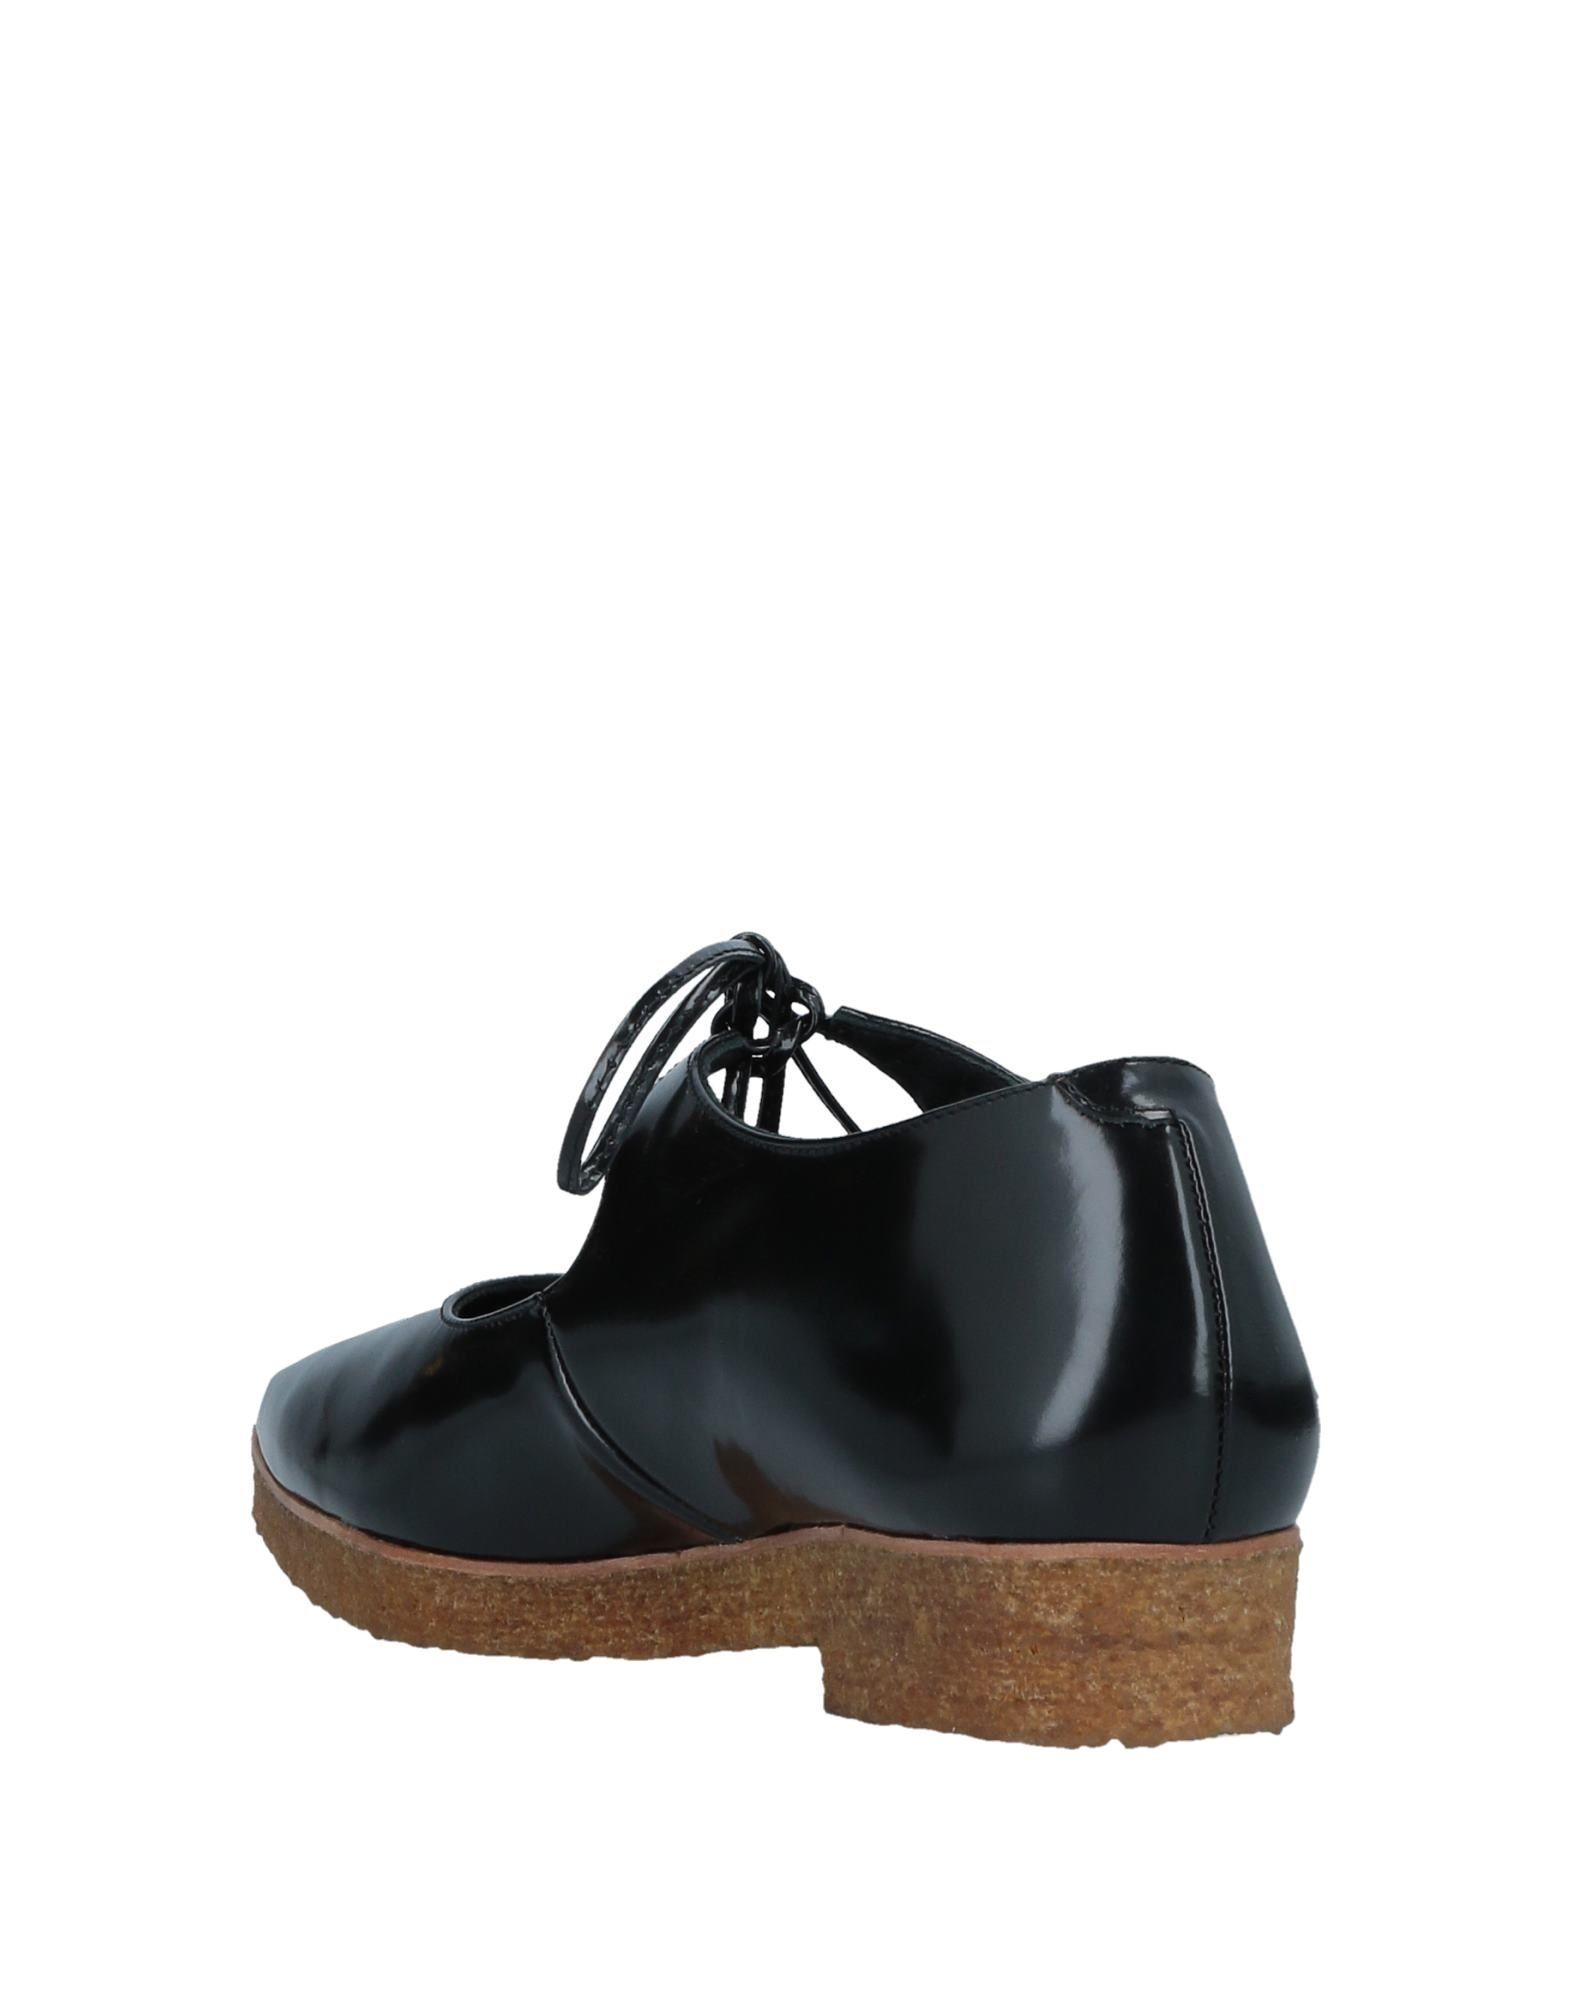 Stilvolle billige billige Stilvolle Schuhe Paloma Barceló Pumps Damen 11509493LI 3f4789